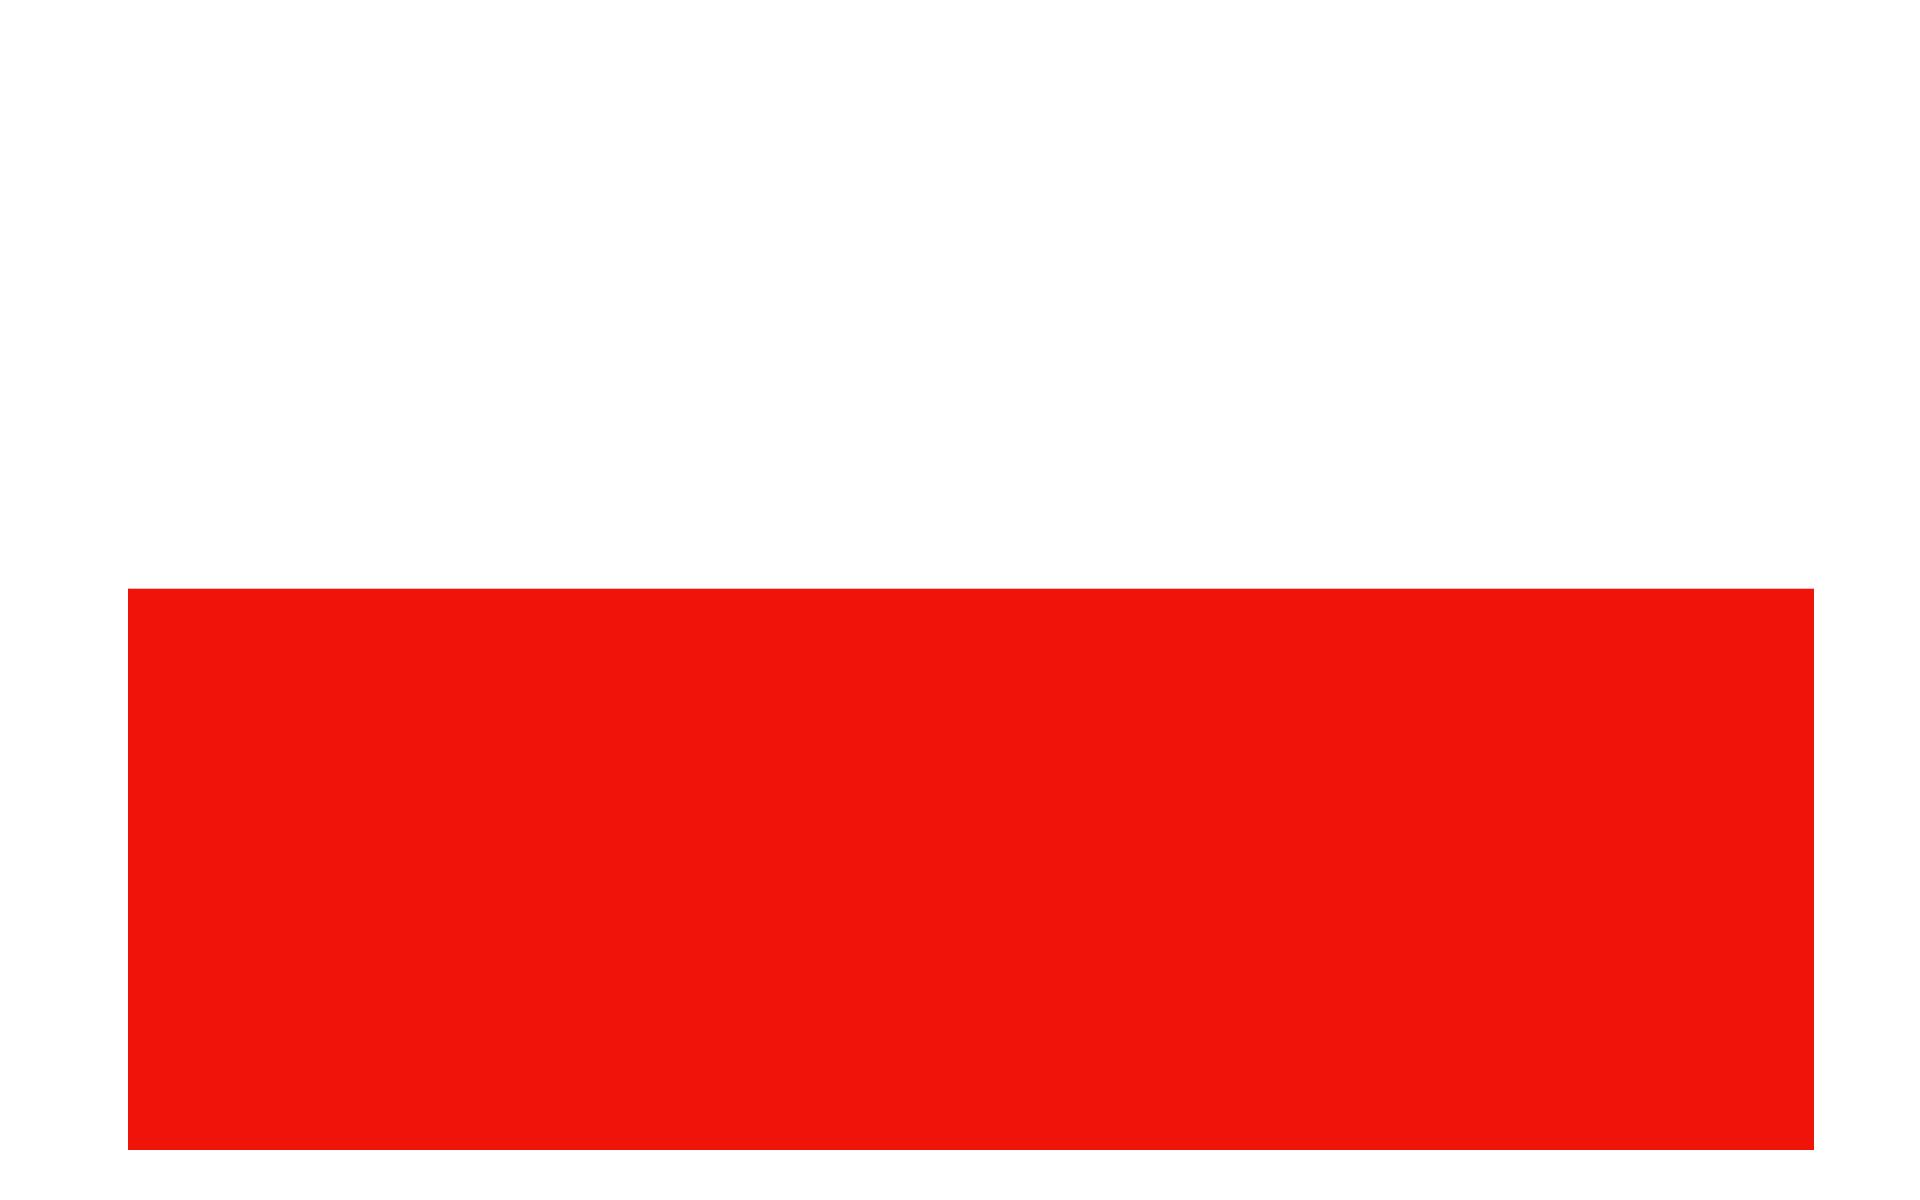 BADEN GERMAN TERRITORY FLAGS Size 5x3 Feet BADEN FLAG